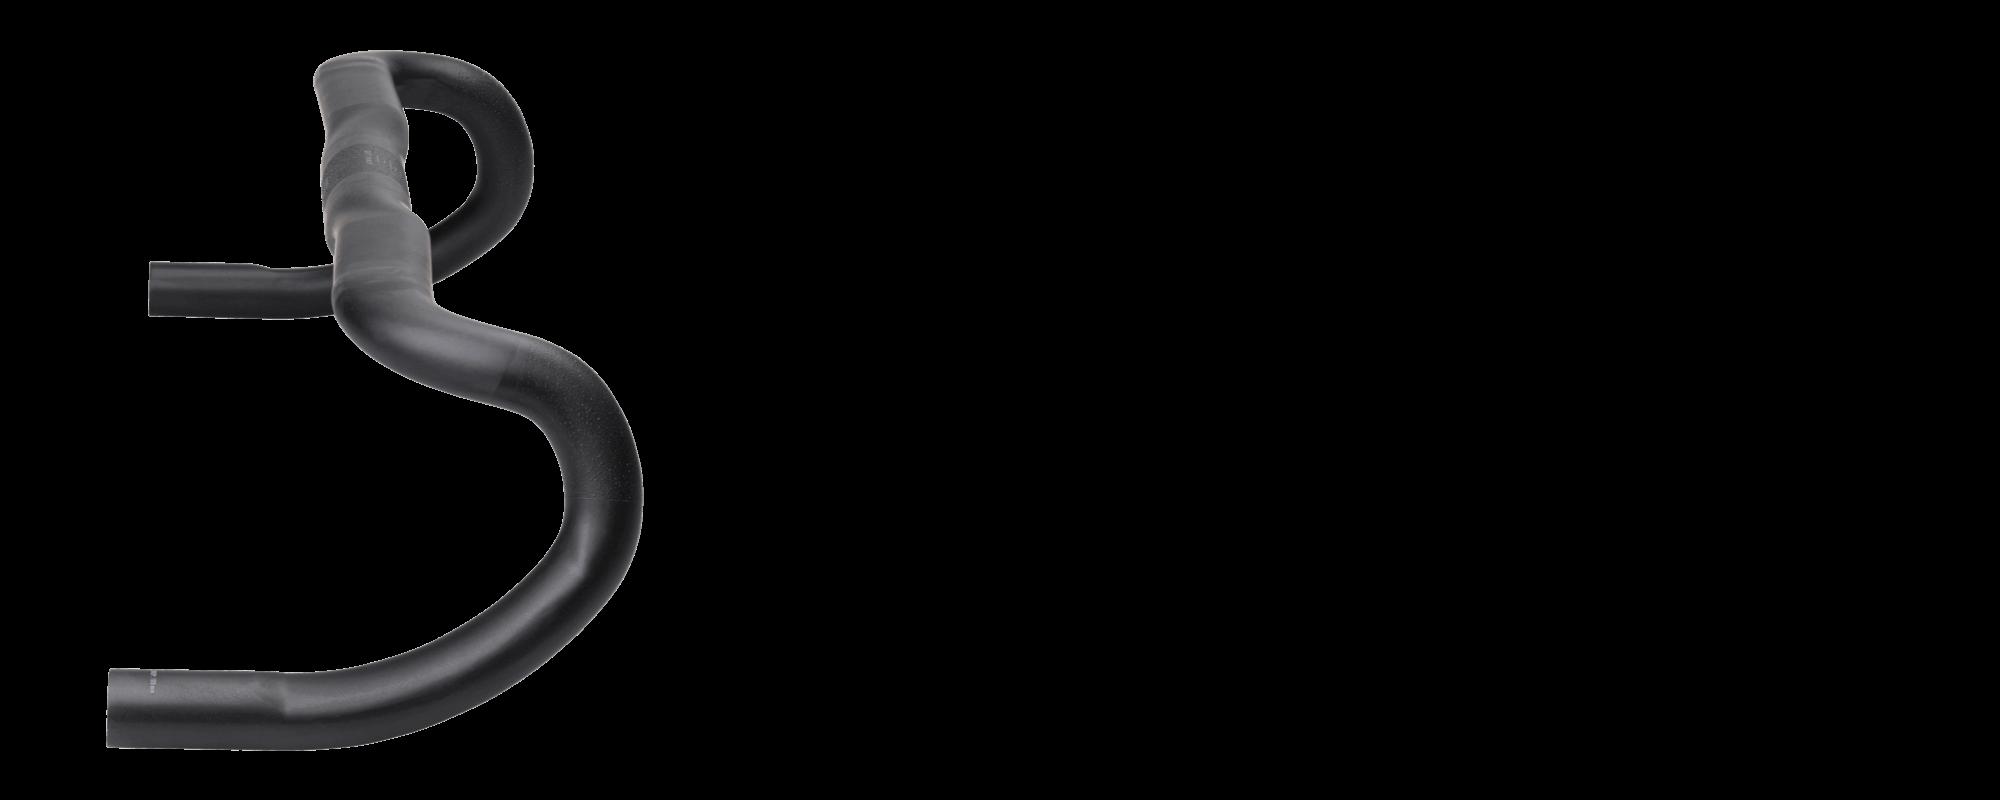 Whisky Spano Drop Handlebar - Carbon - Profile